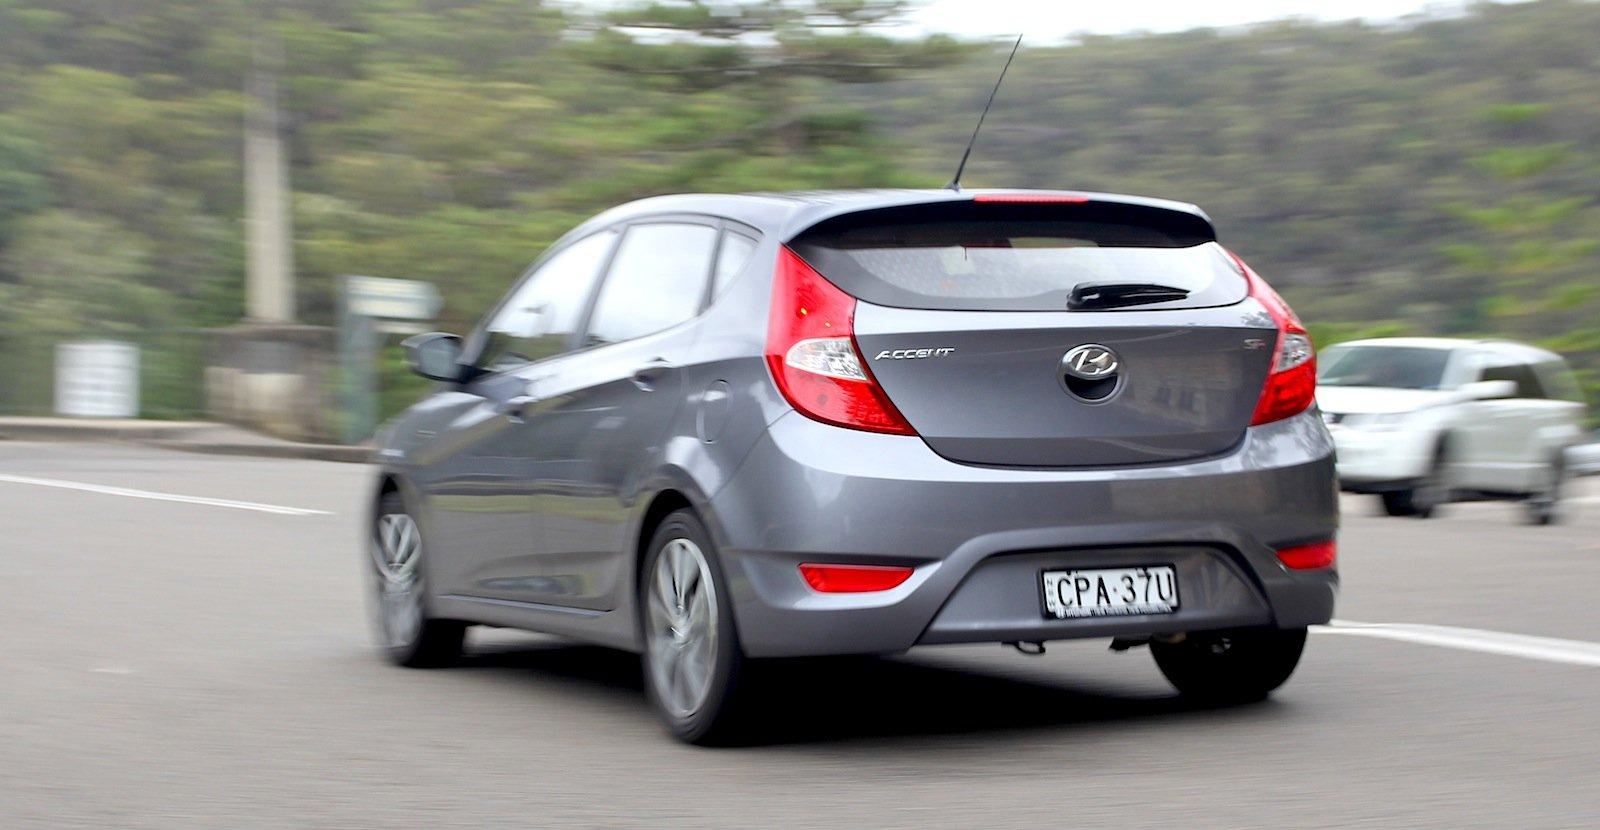 2017 Honda Civic Lx >> 2014 Hyundai Accent Review: SR   CarAdvice